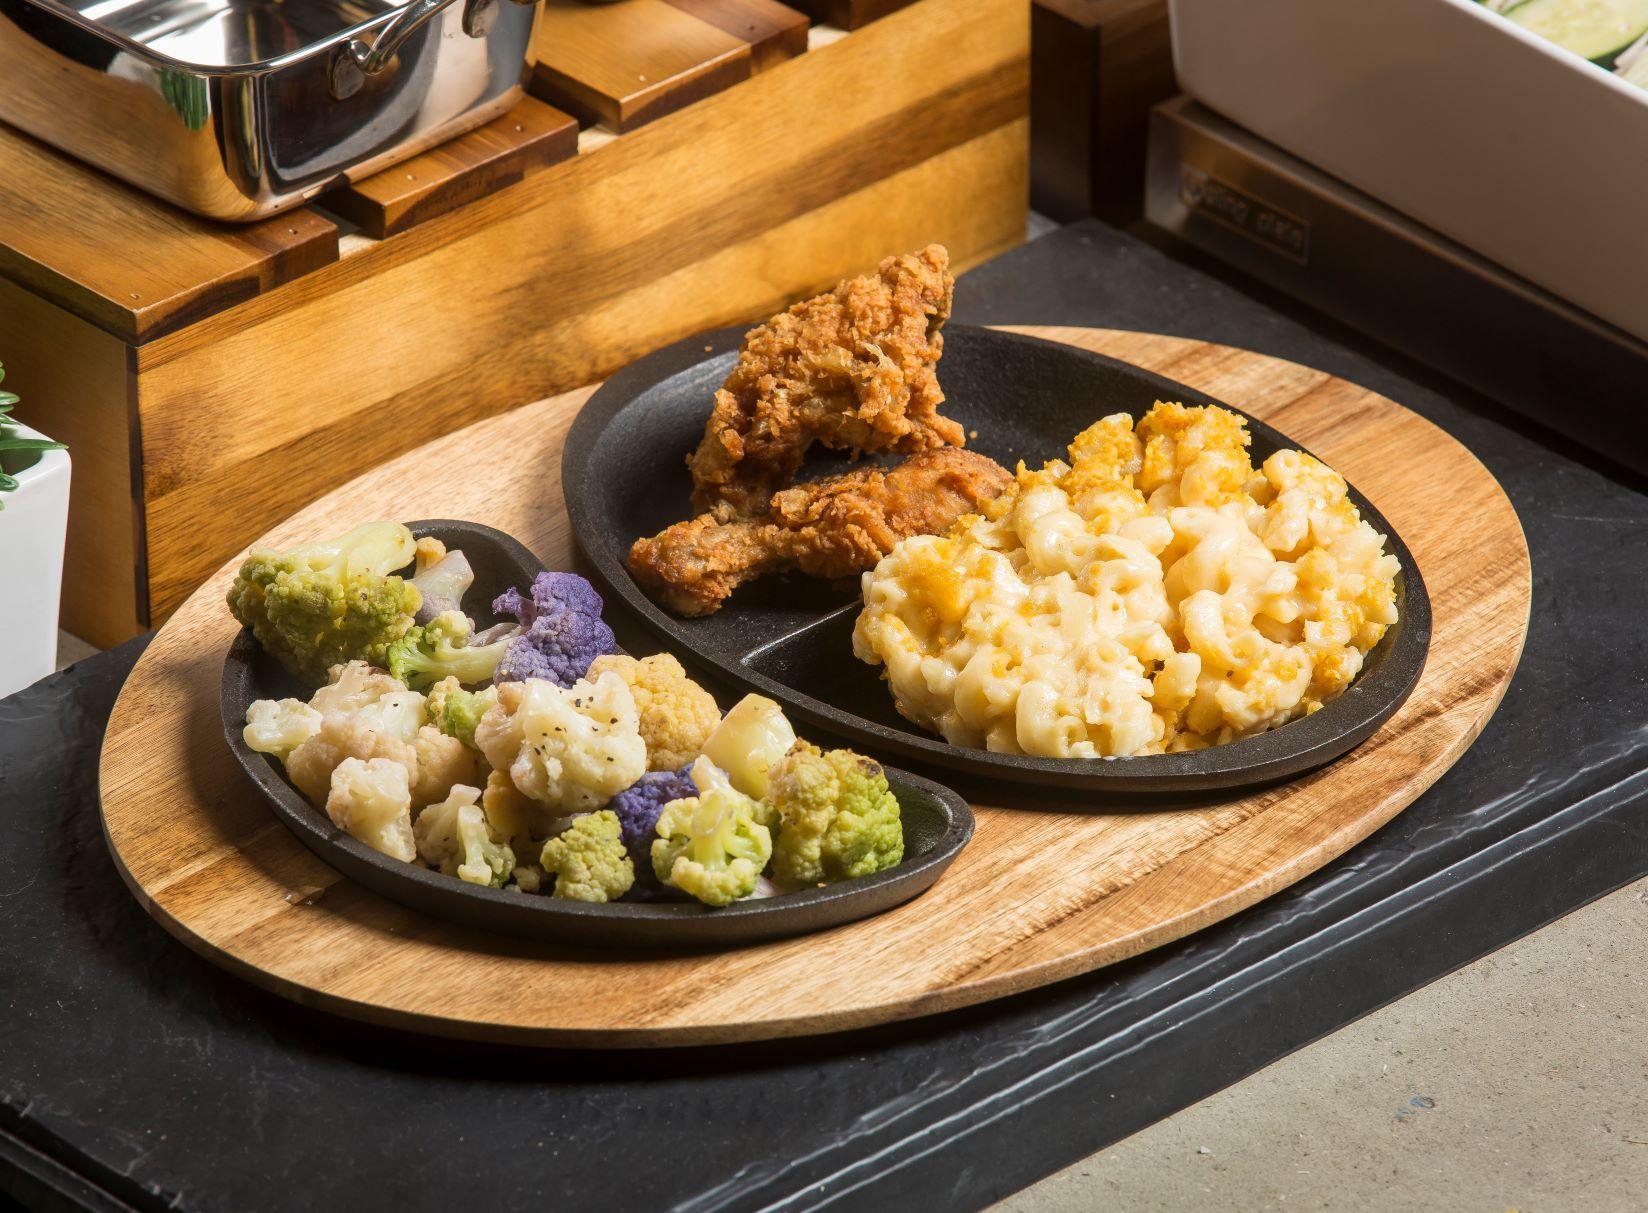 fajita platter with fried chicken and veggies